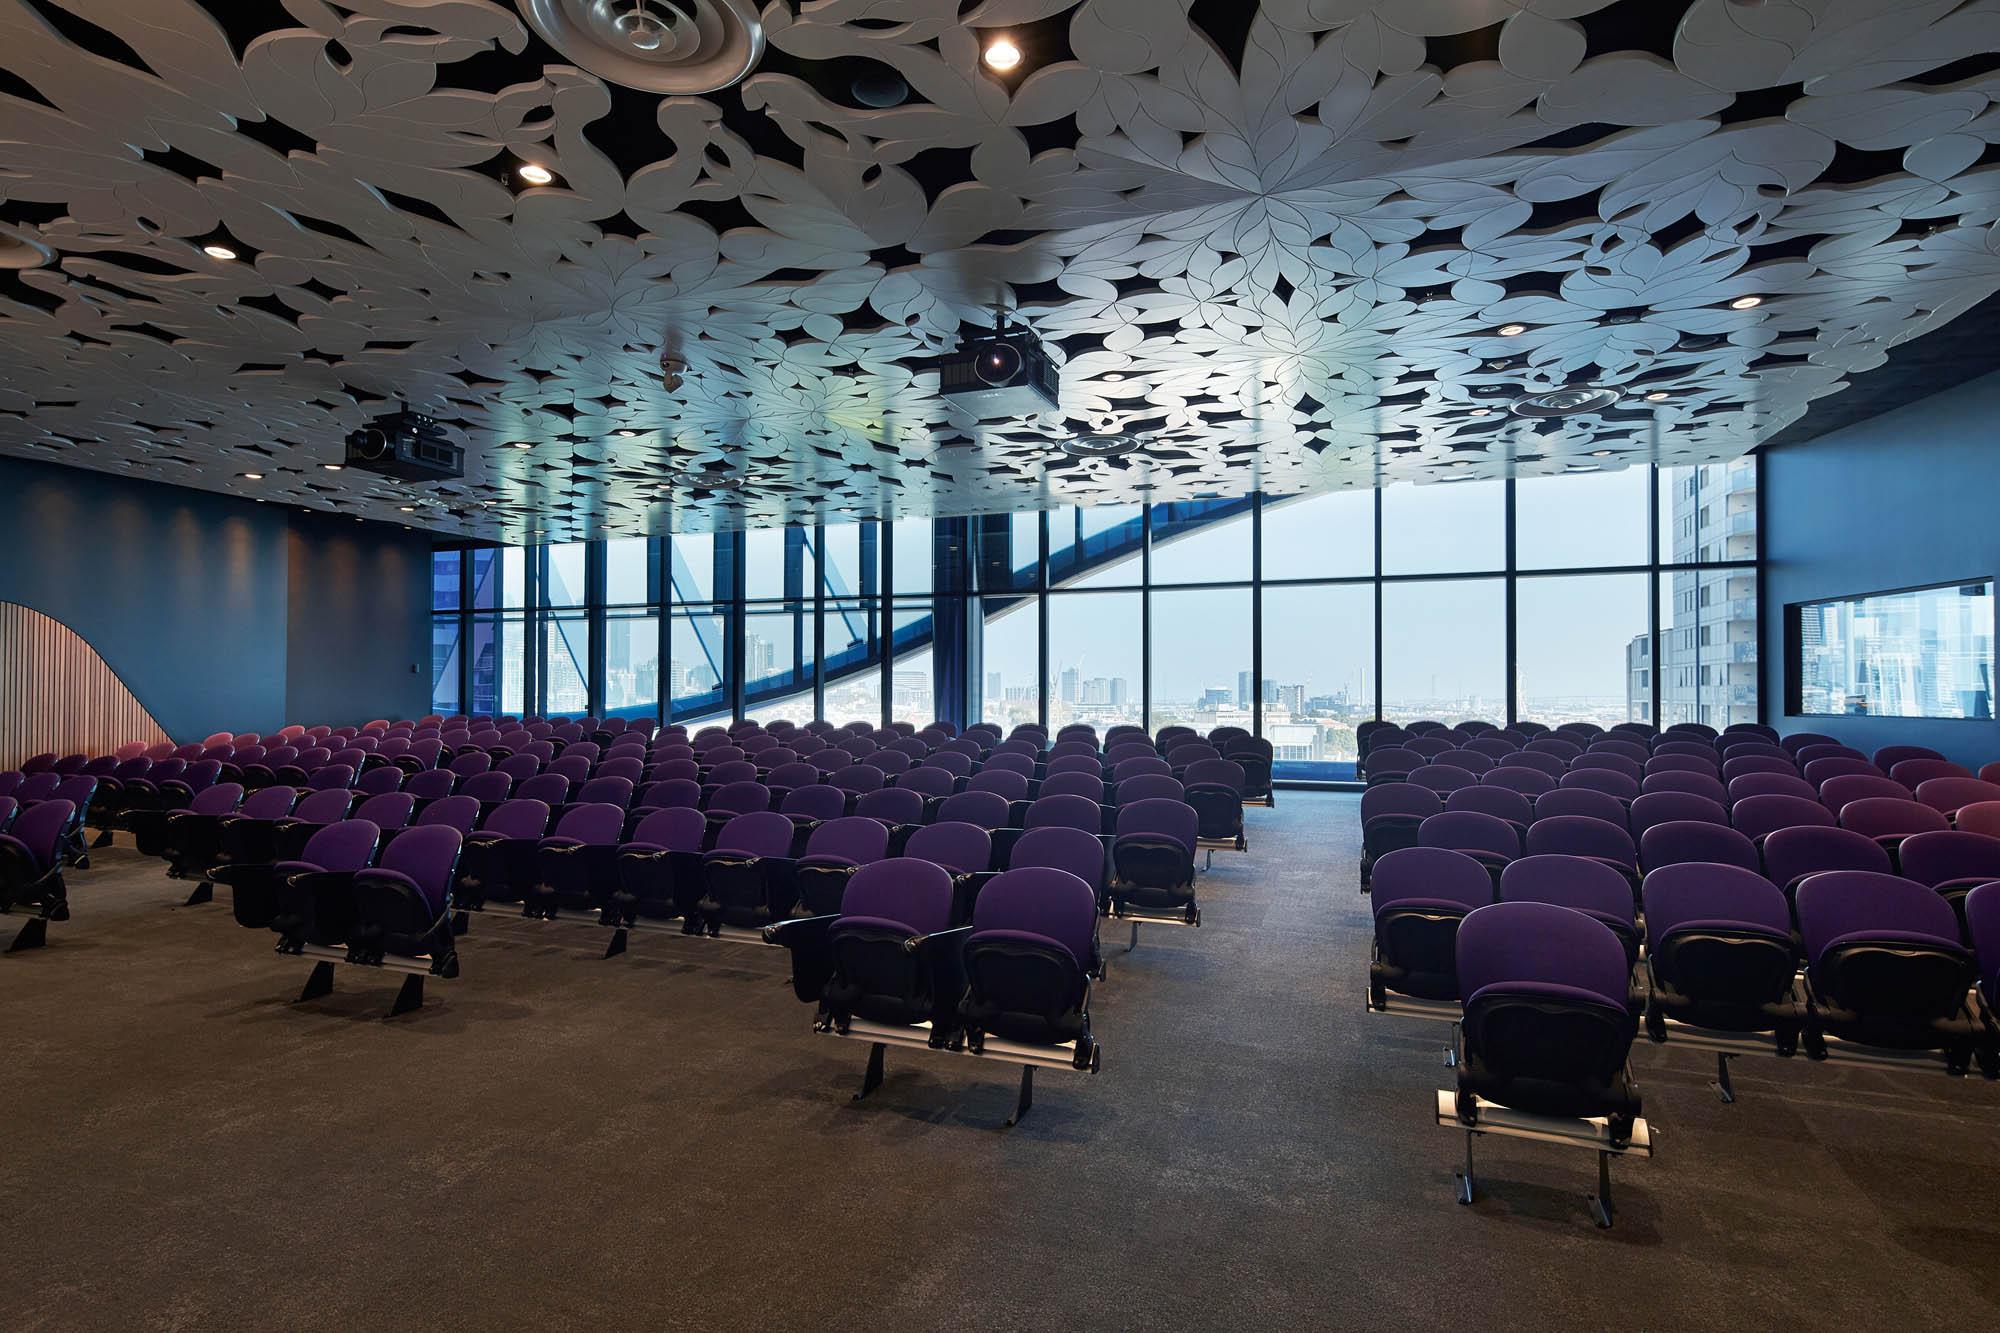 Victorian comprehensive cancer centre melbourne lecture theatre purple chairs